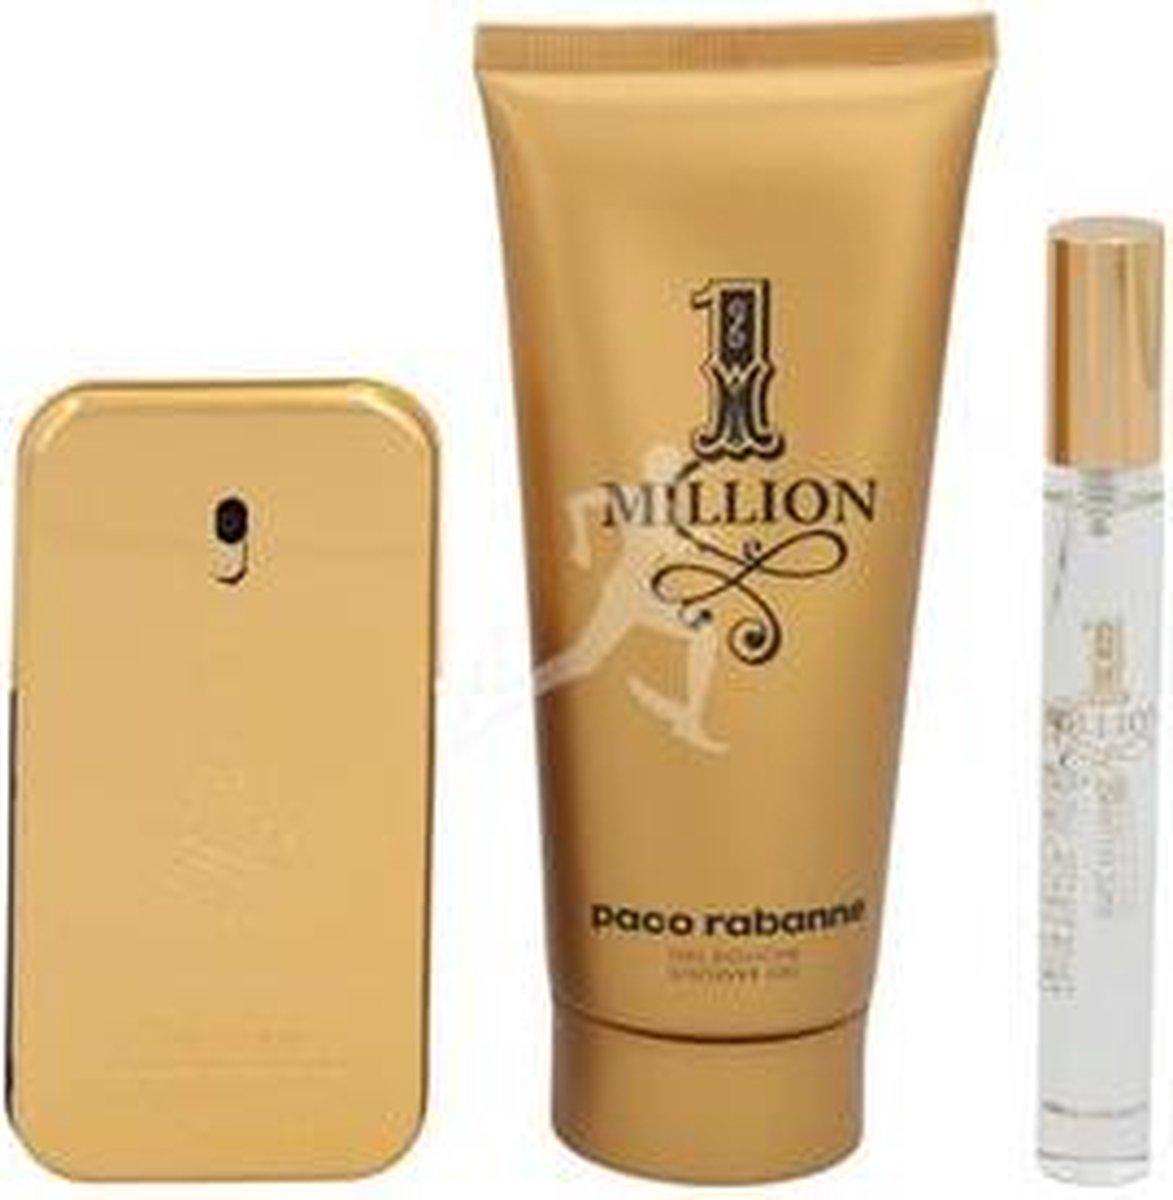 Paco Rabanne 1 Million Set Eau de toilette Spray 50Ml/Shower Gel 100Ml/Edt Travel Spray 10Ml